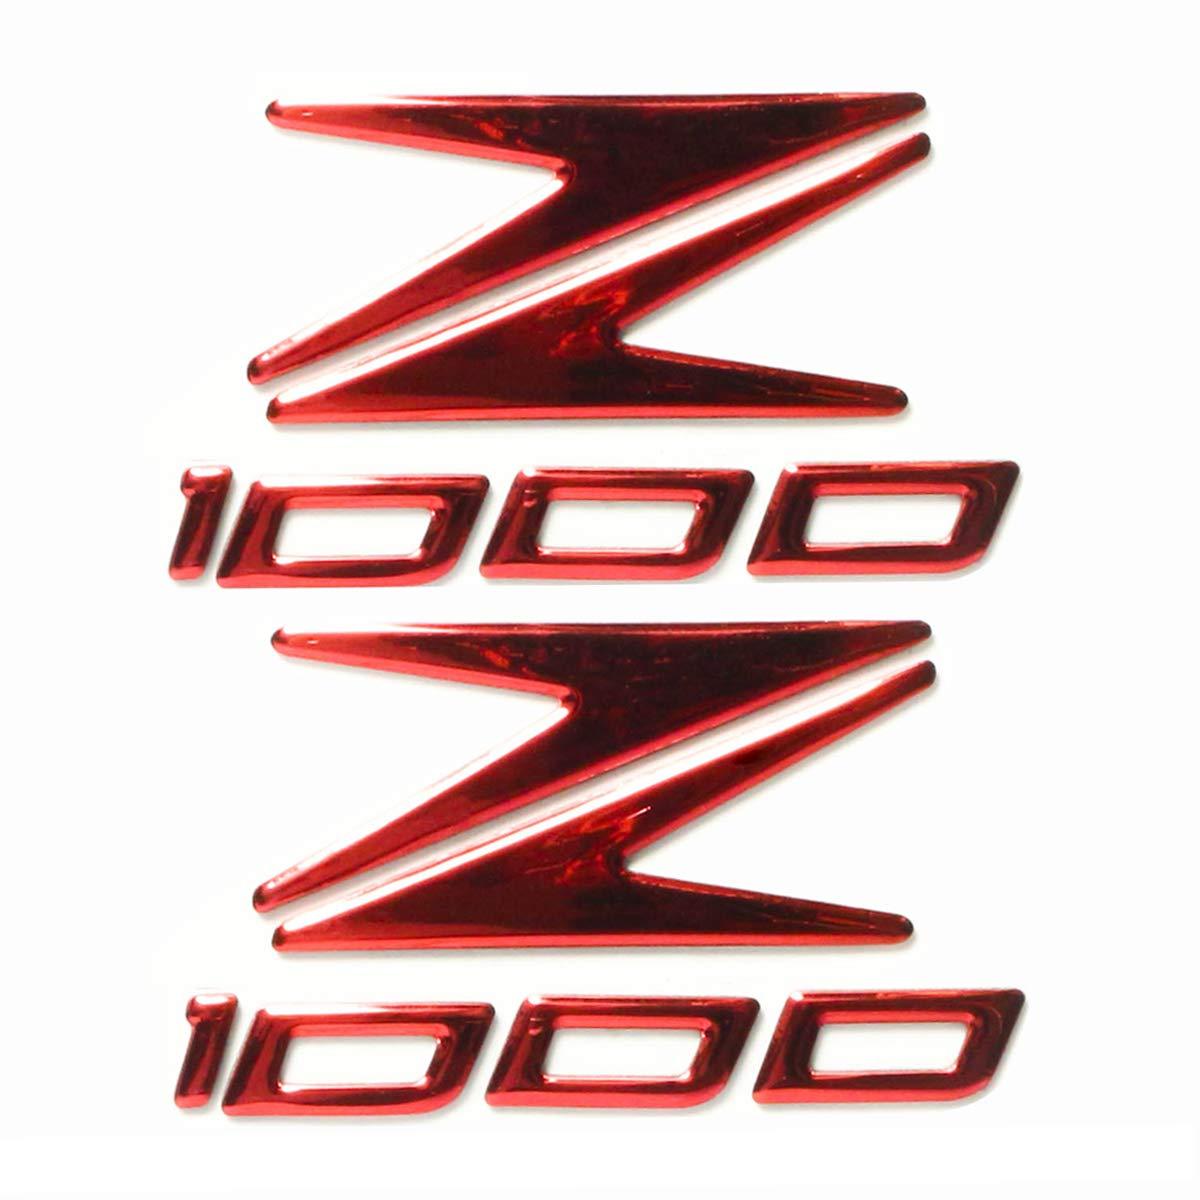 Amazon.com: ZAIXU Motorcycle 3D Raise Fuel Oil Tank Sign ...